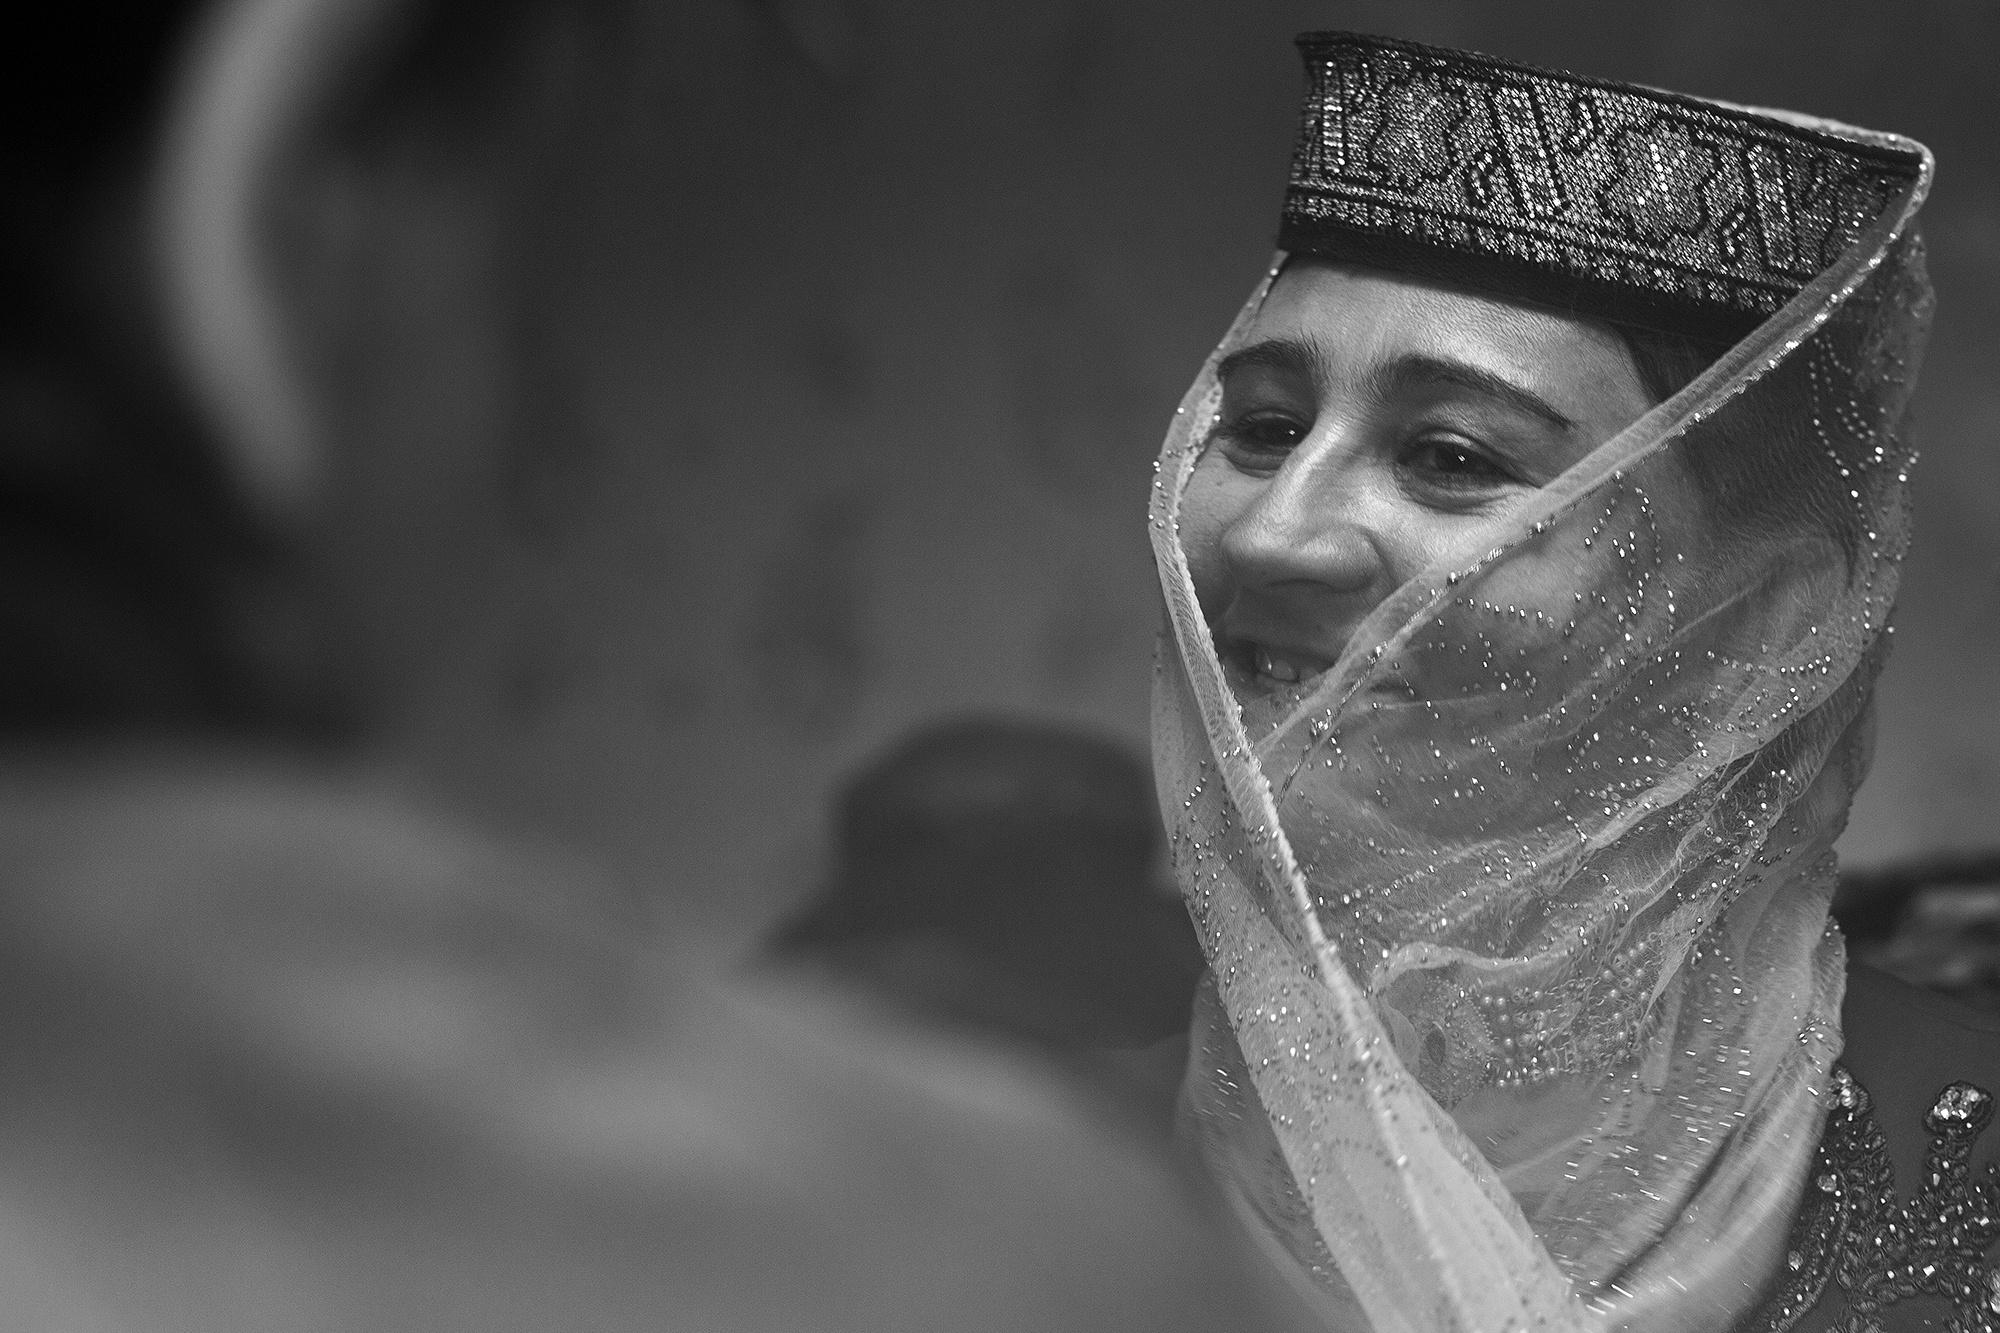 Xinjiang Région ouïghoure Maxime Crozet Identité Chine Tadjike Femme